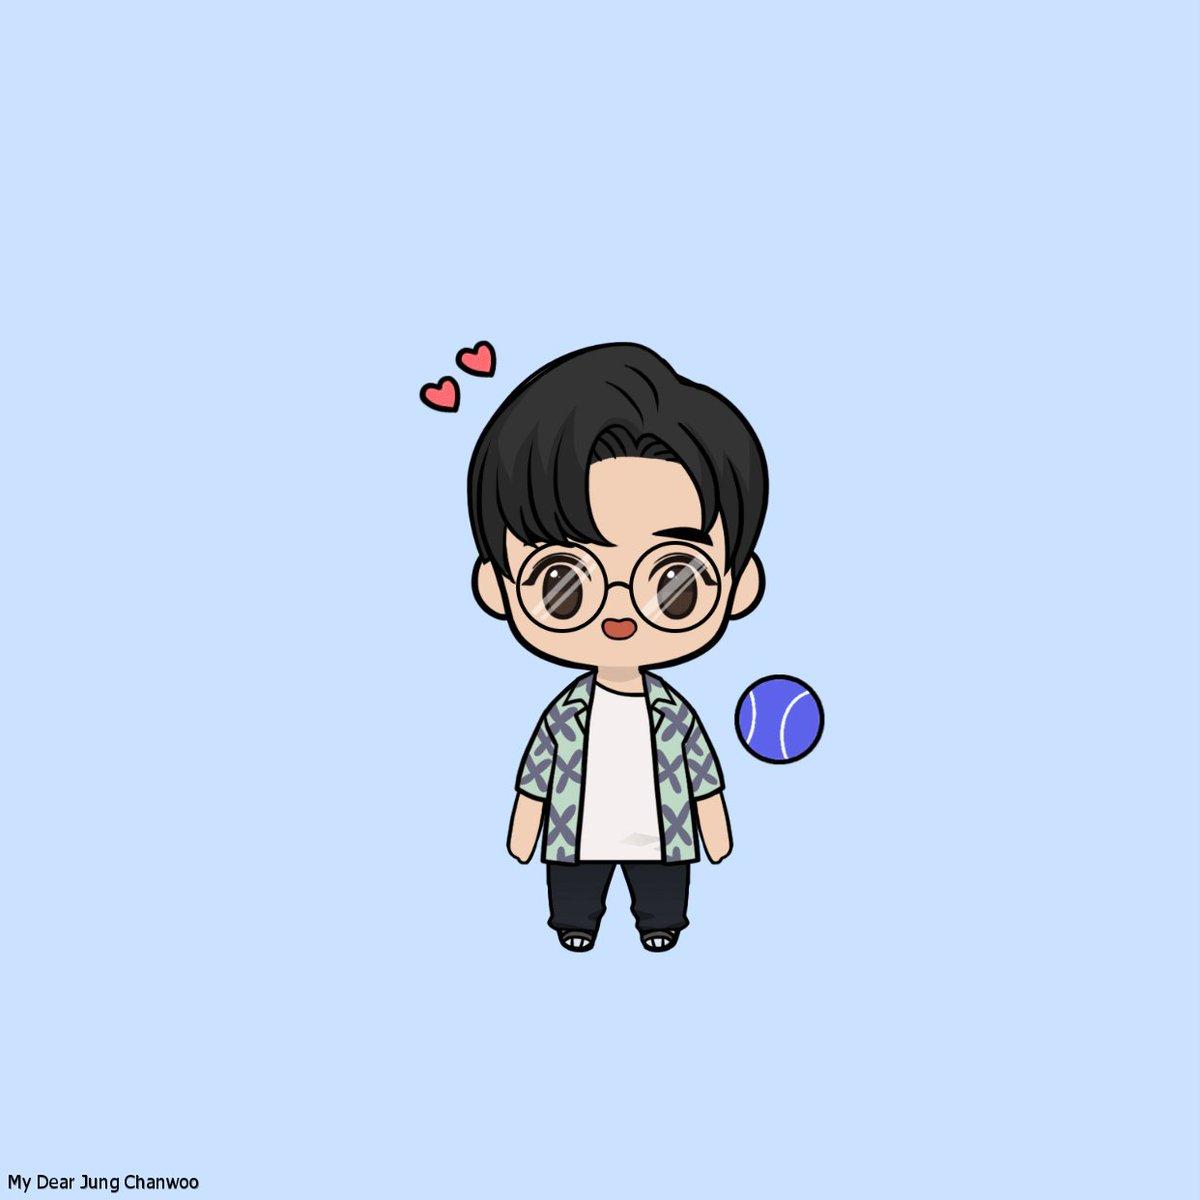 Godmadehanbin On Twitter How About My Doll Oppa Doll App Is So Cute